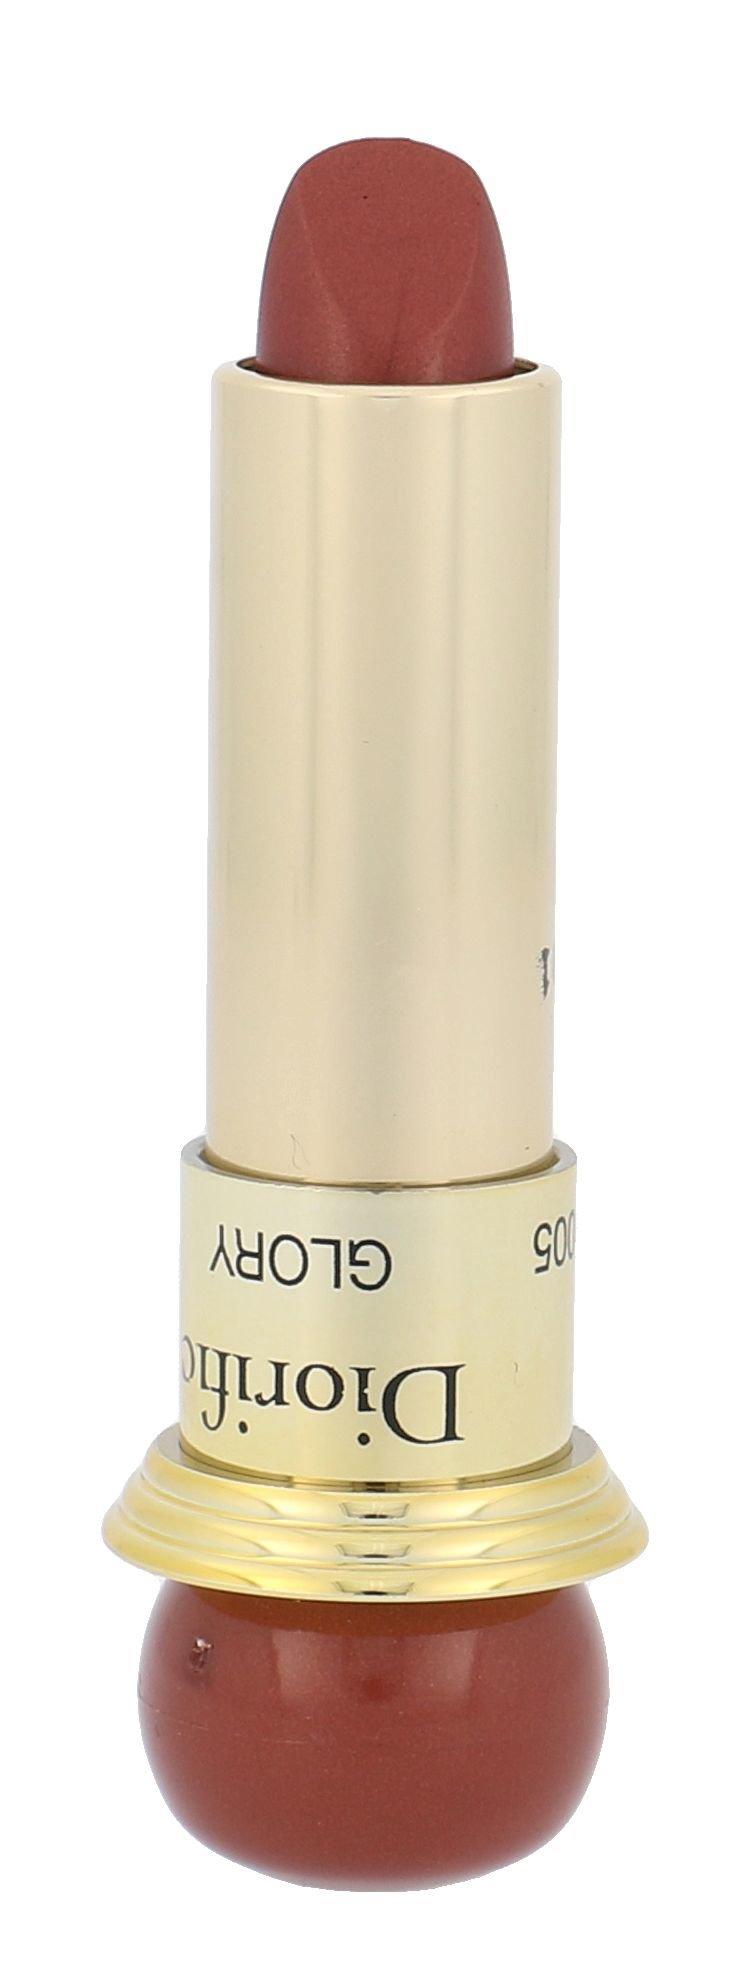 Christian Dior Diorific Cosmetic 3,5ml 005 Glory